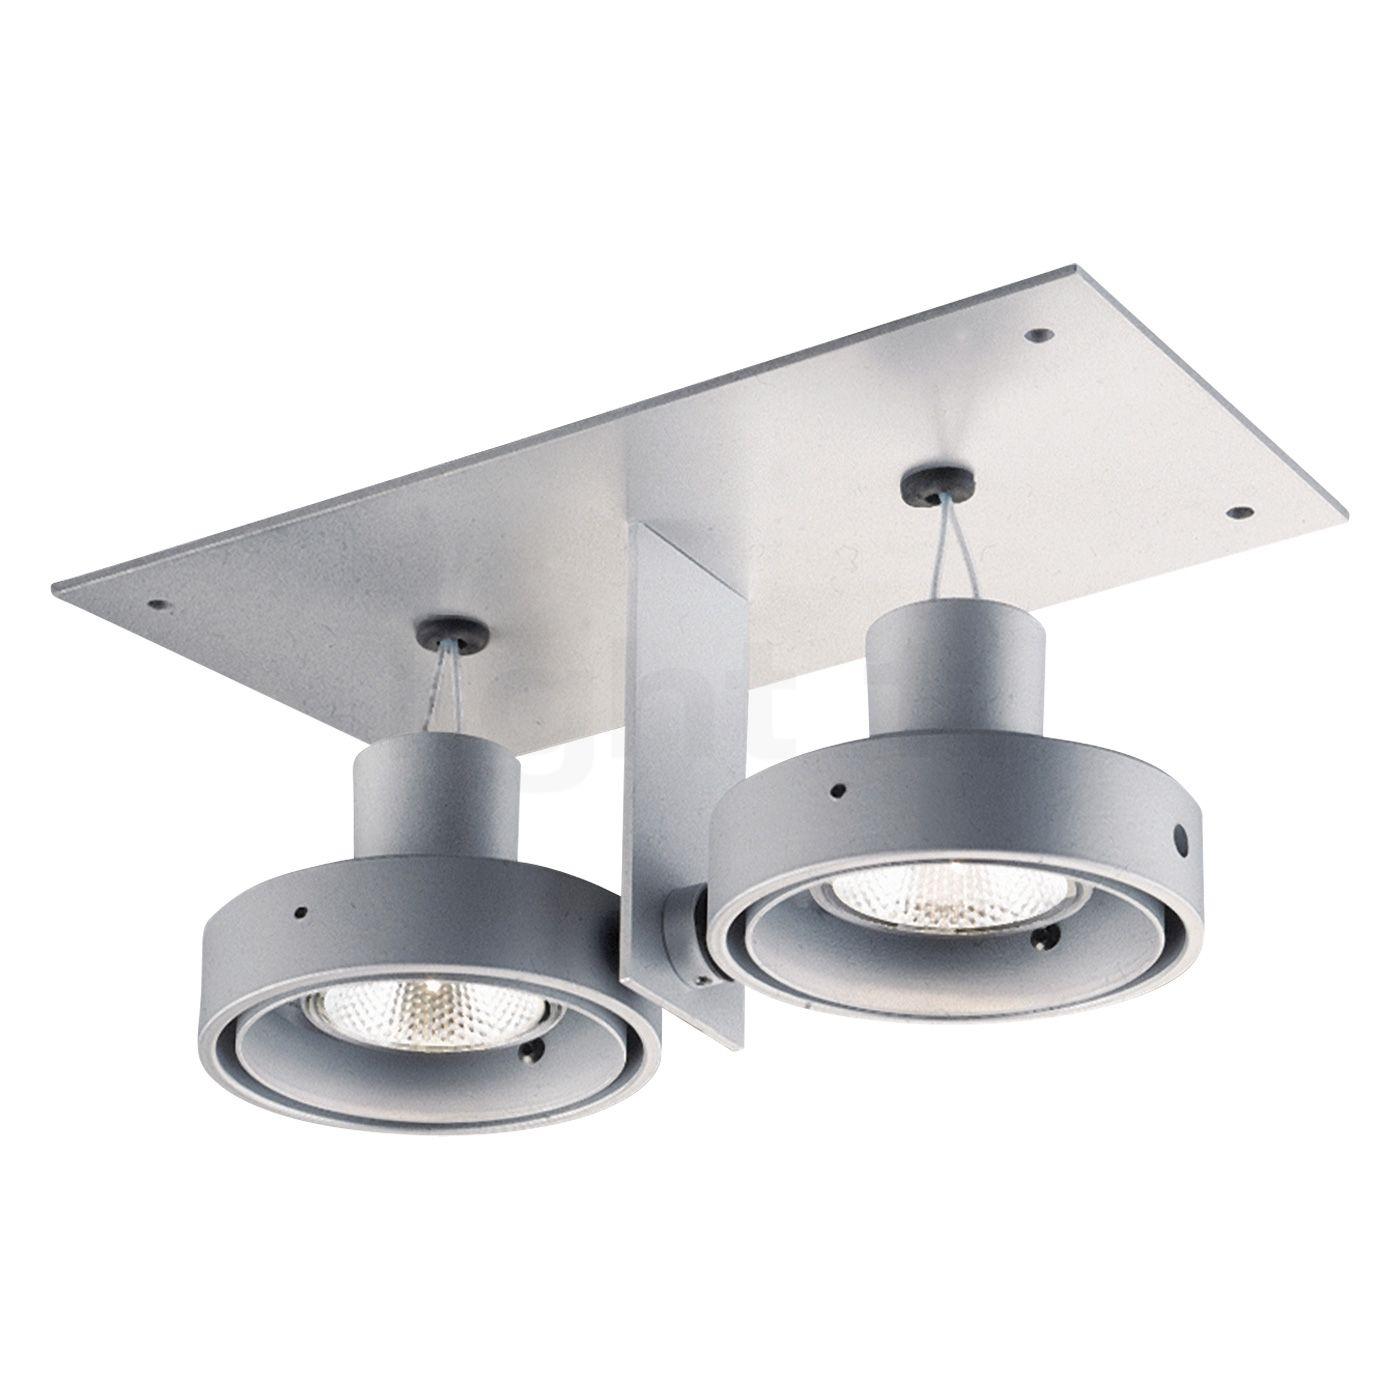 delta light minigrid in zb 2 50 hi strahler und spot. Black Bedroom Furniture Sets. Home Design Ideas